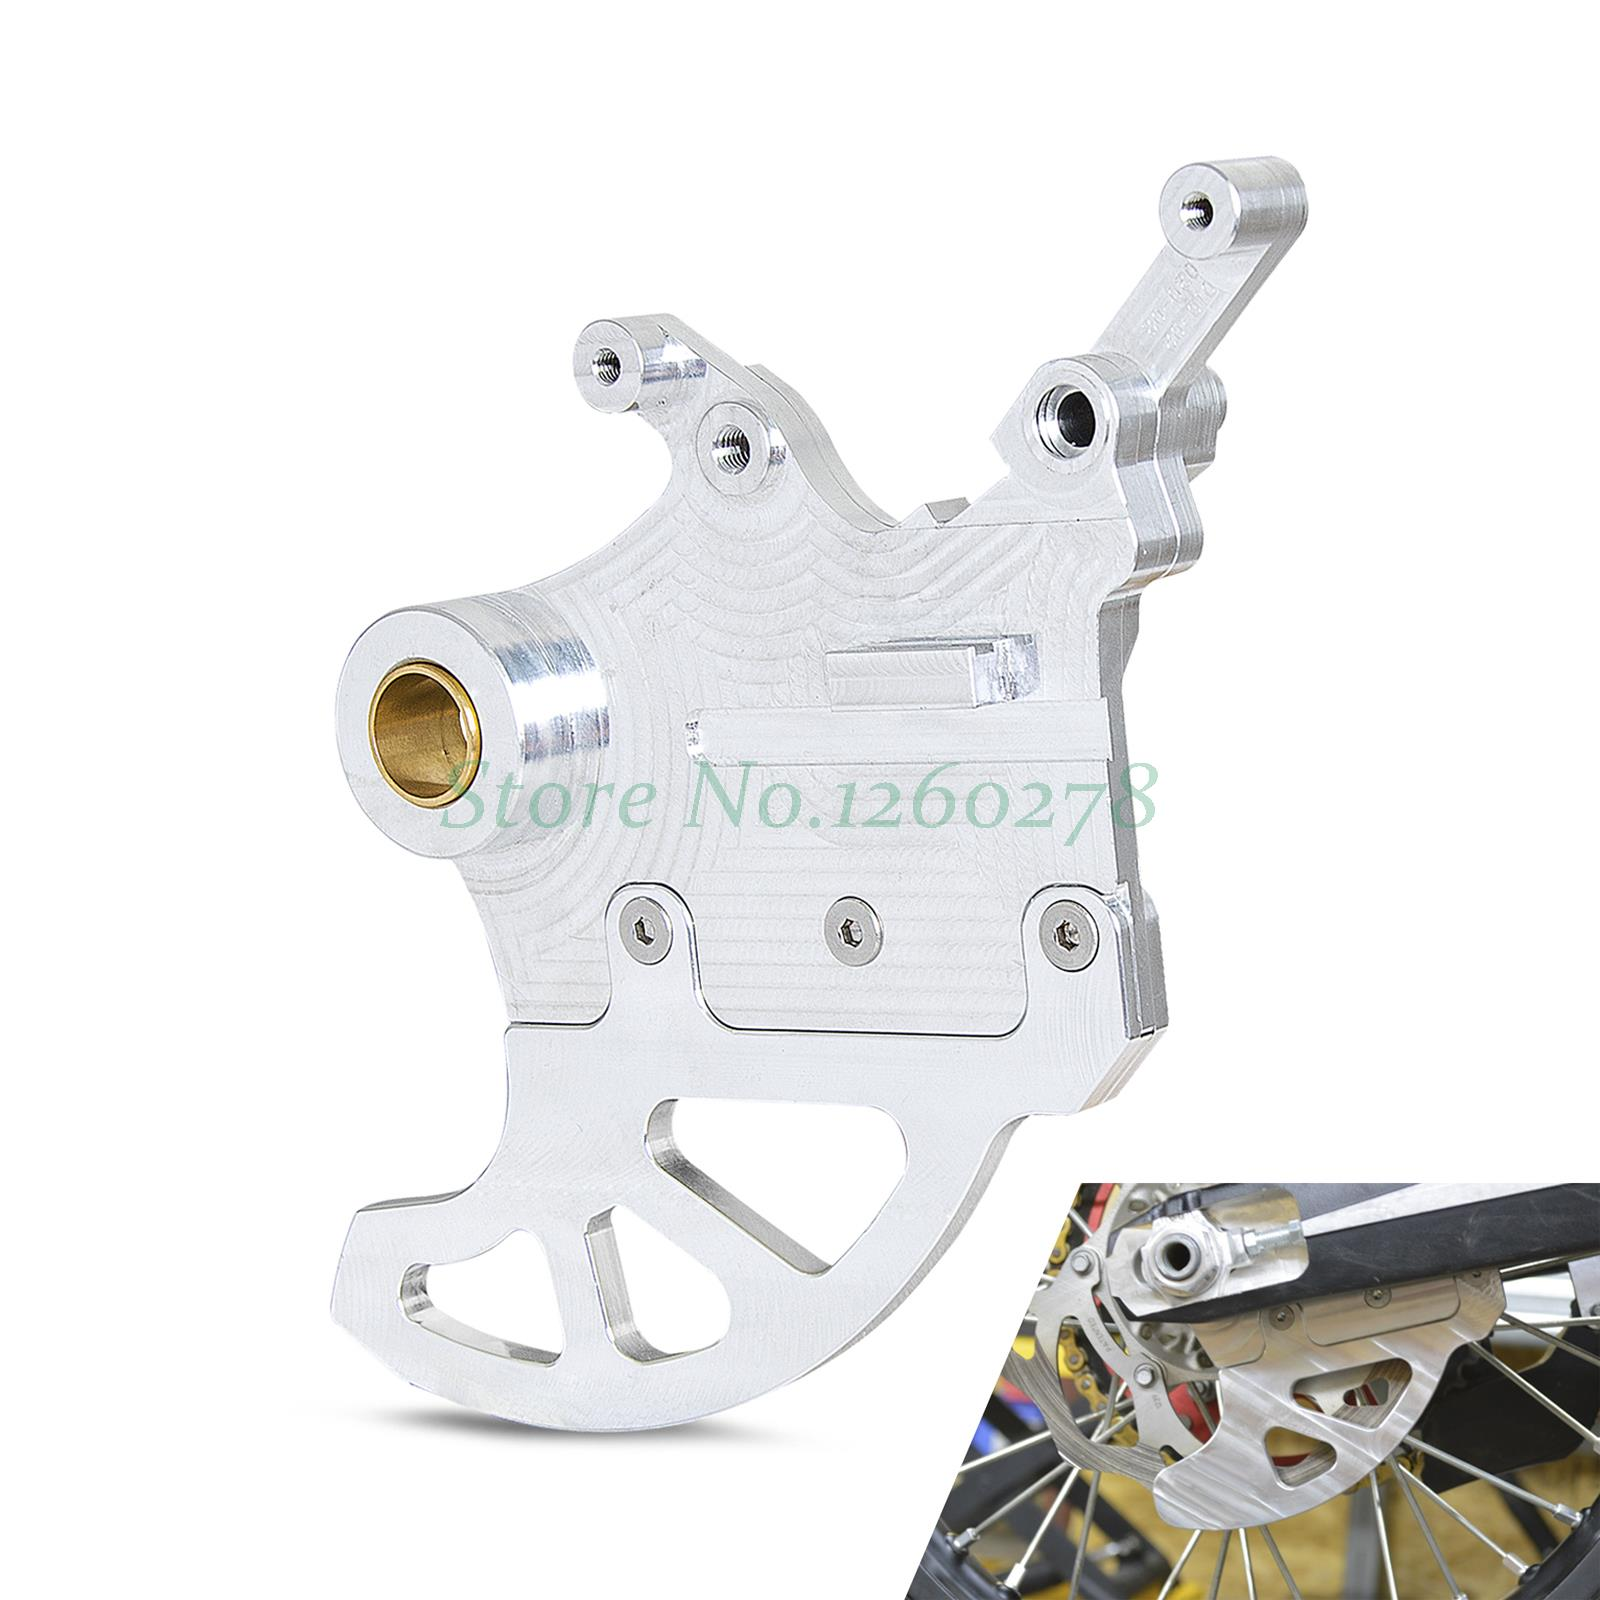 NICECNC Brake Disc Guard Protector for Yamaha YZ250 YZ125 2006-2015 YZ250X YZ450X YZ250FX YZ450FX 2006 2007 2008 keoghs real adelin 260mm floating brake disc high quality for yamaha scooter cygnus modify